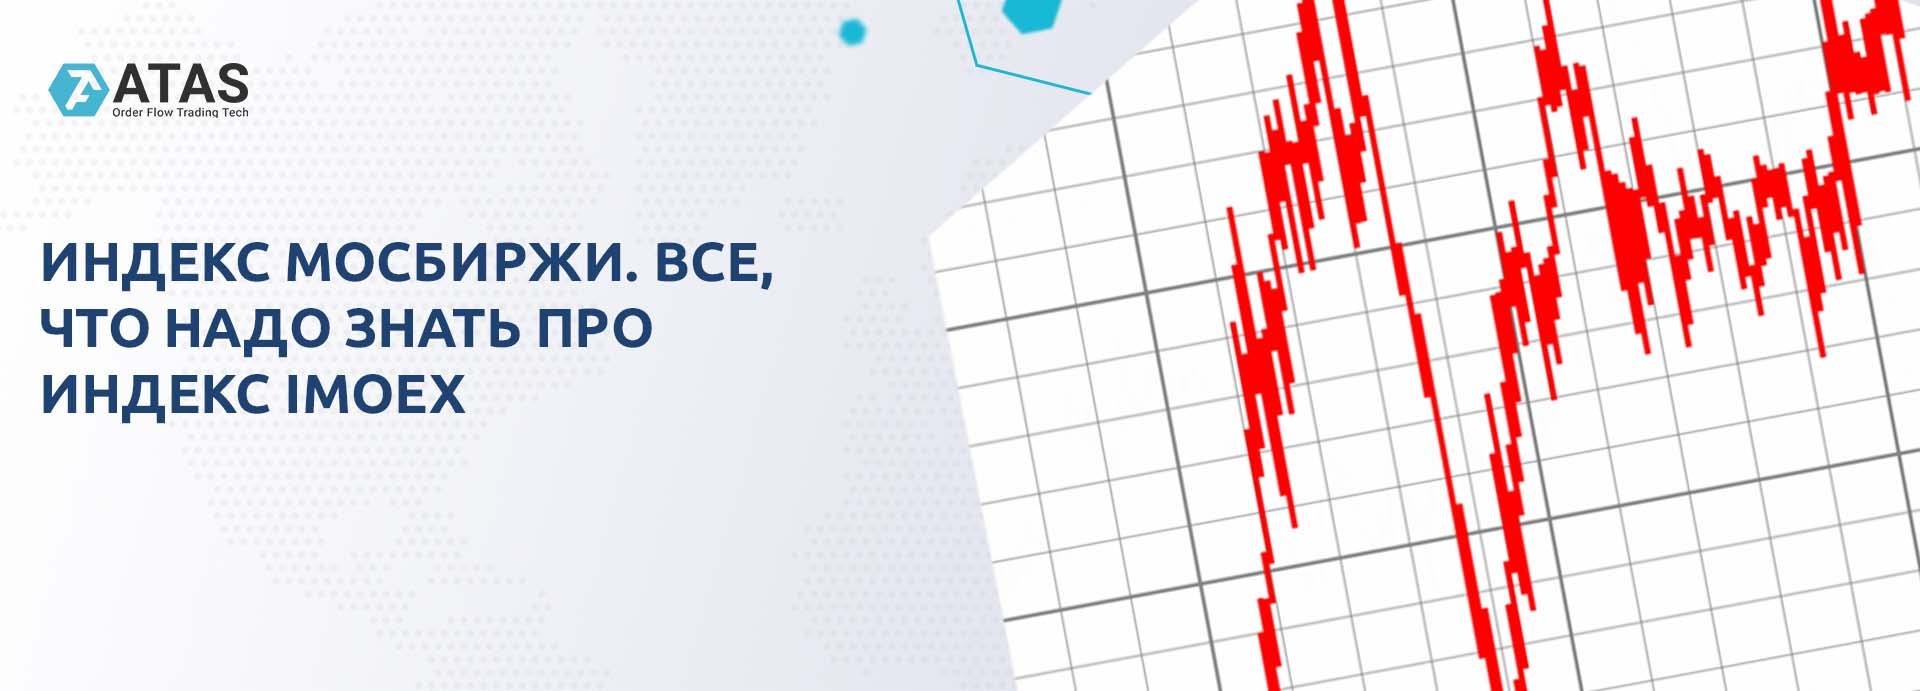 Индекс МосБиржи. Все, что надо знать про индекс IMOEX